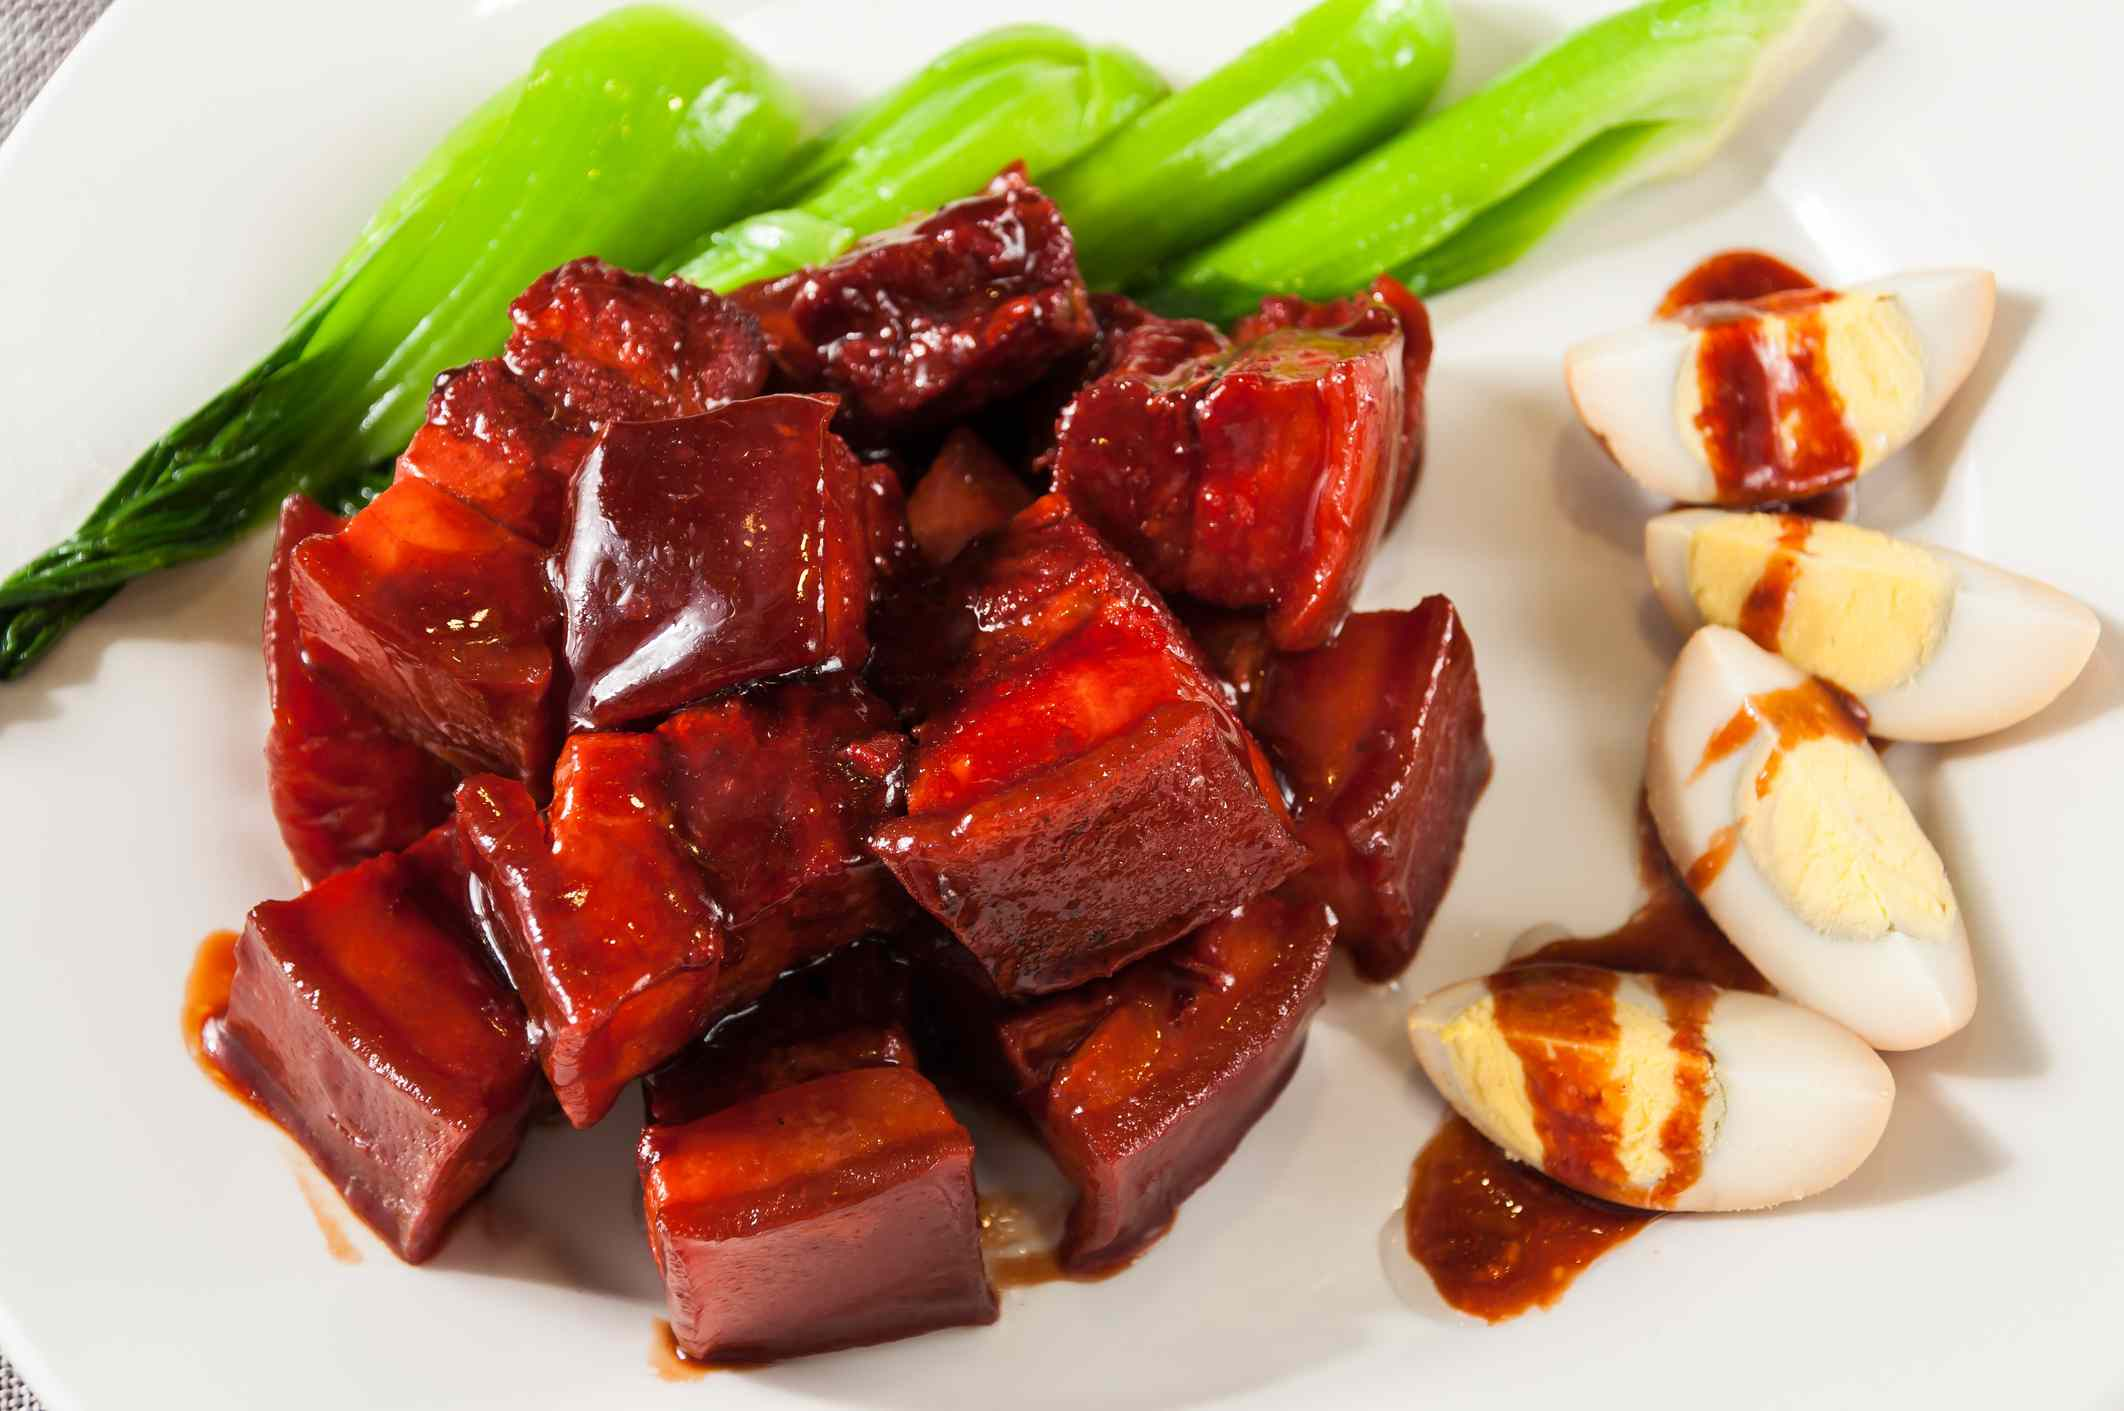 Chinese Braised Pork, Hong Shao Rou